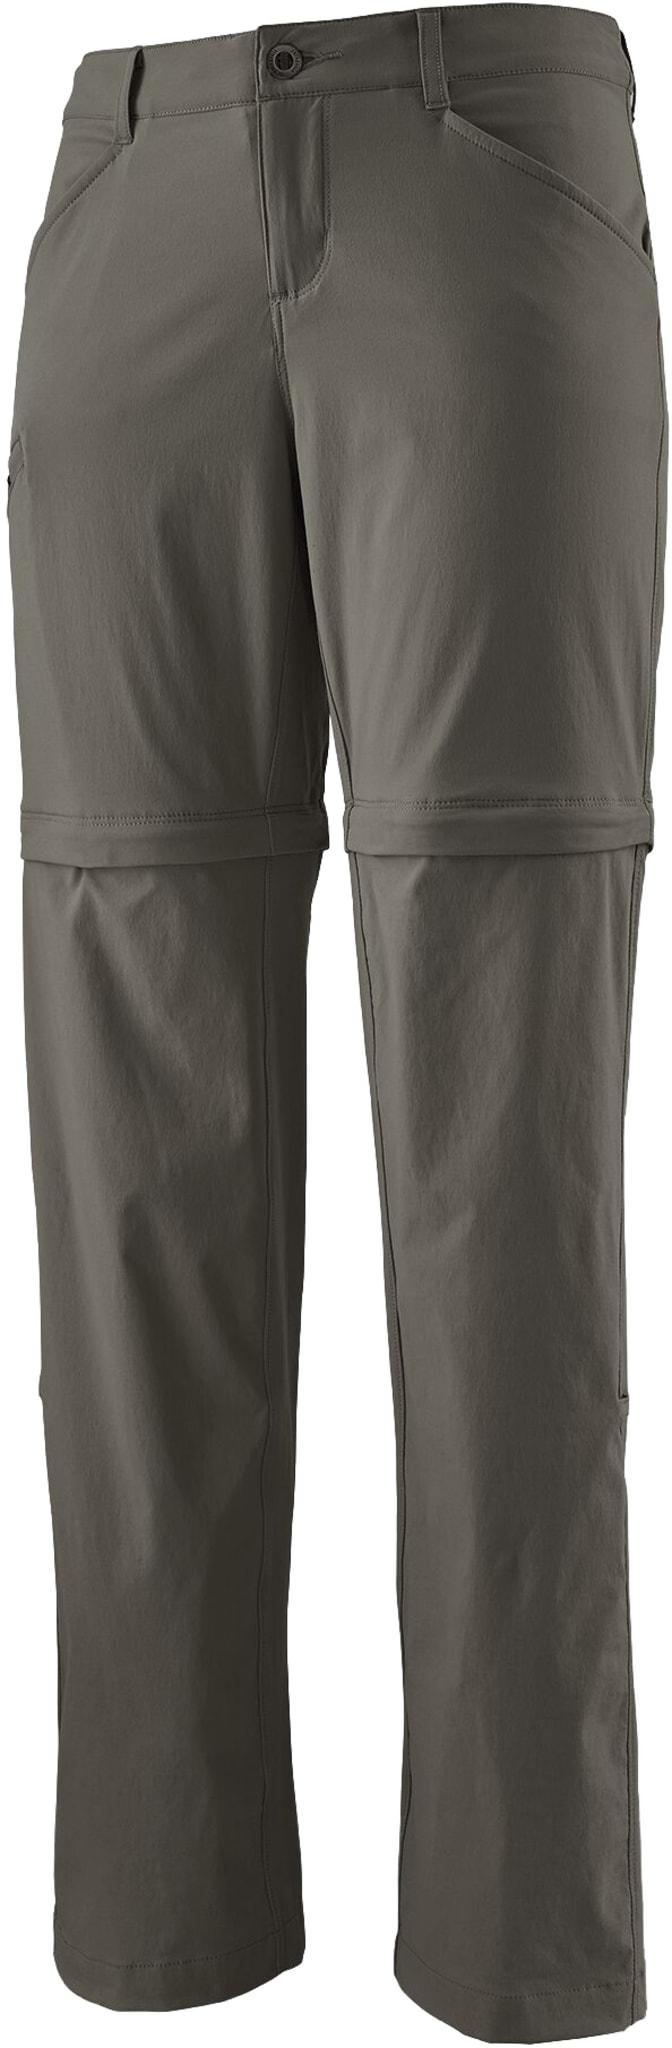 Quandary Convertible Pants W